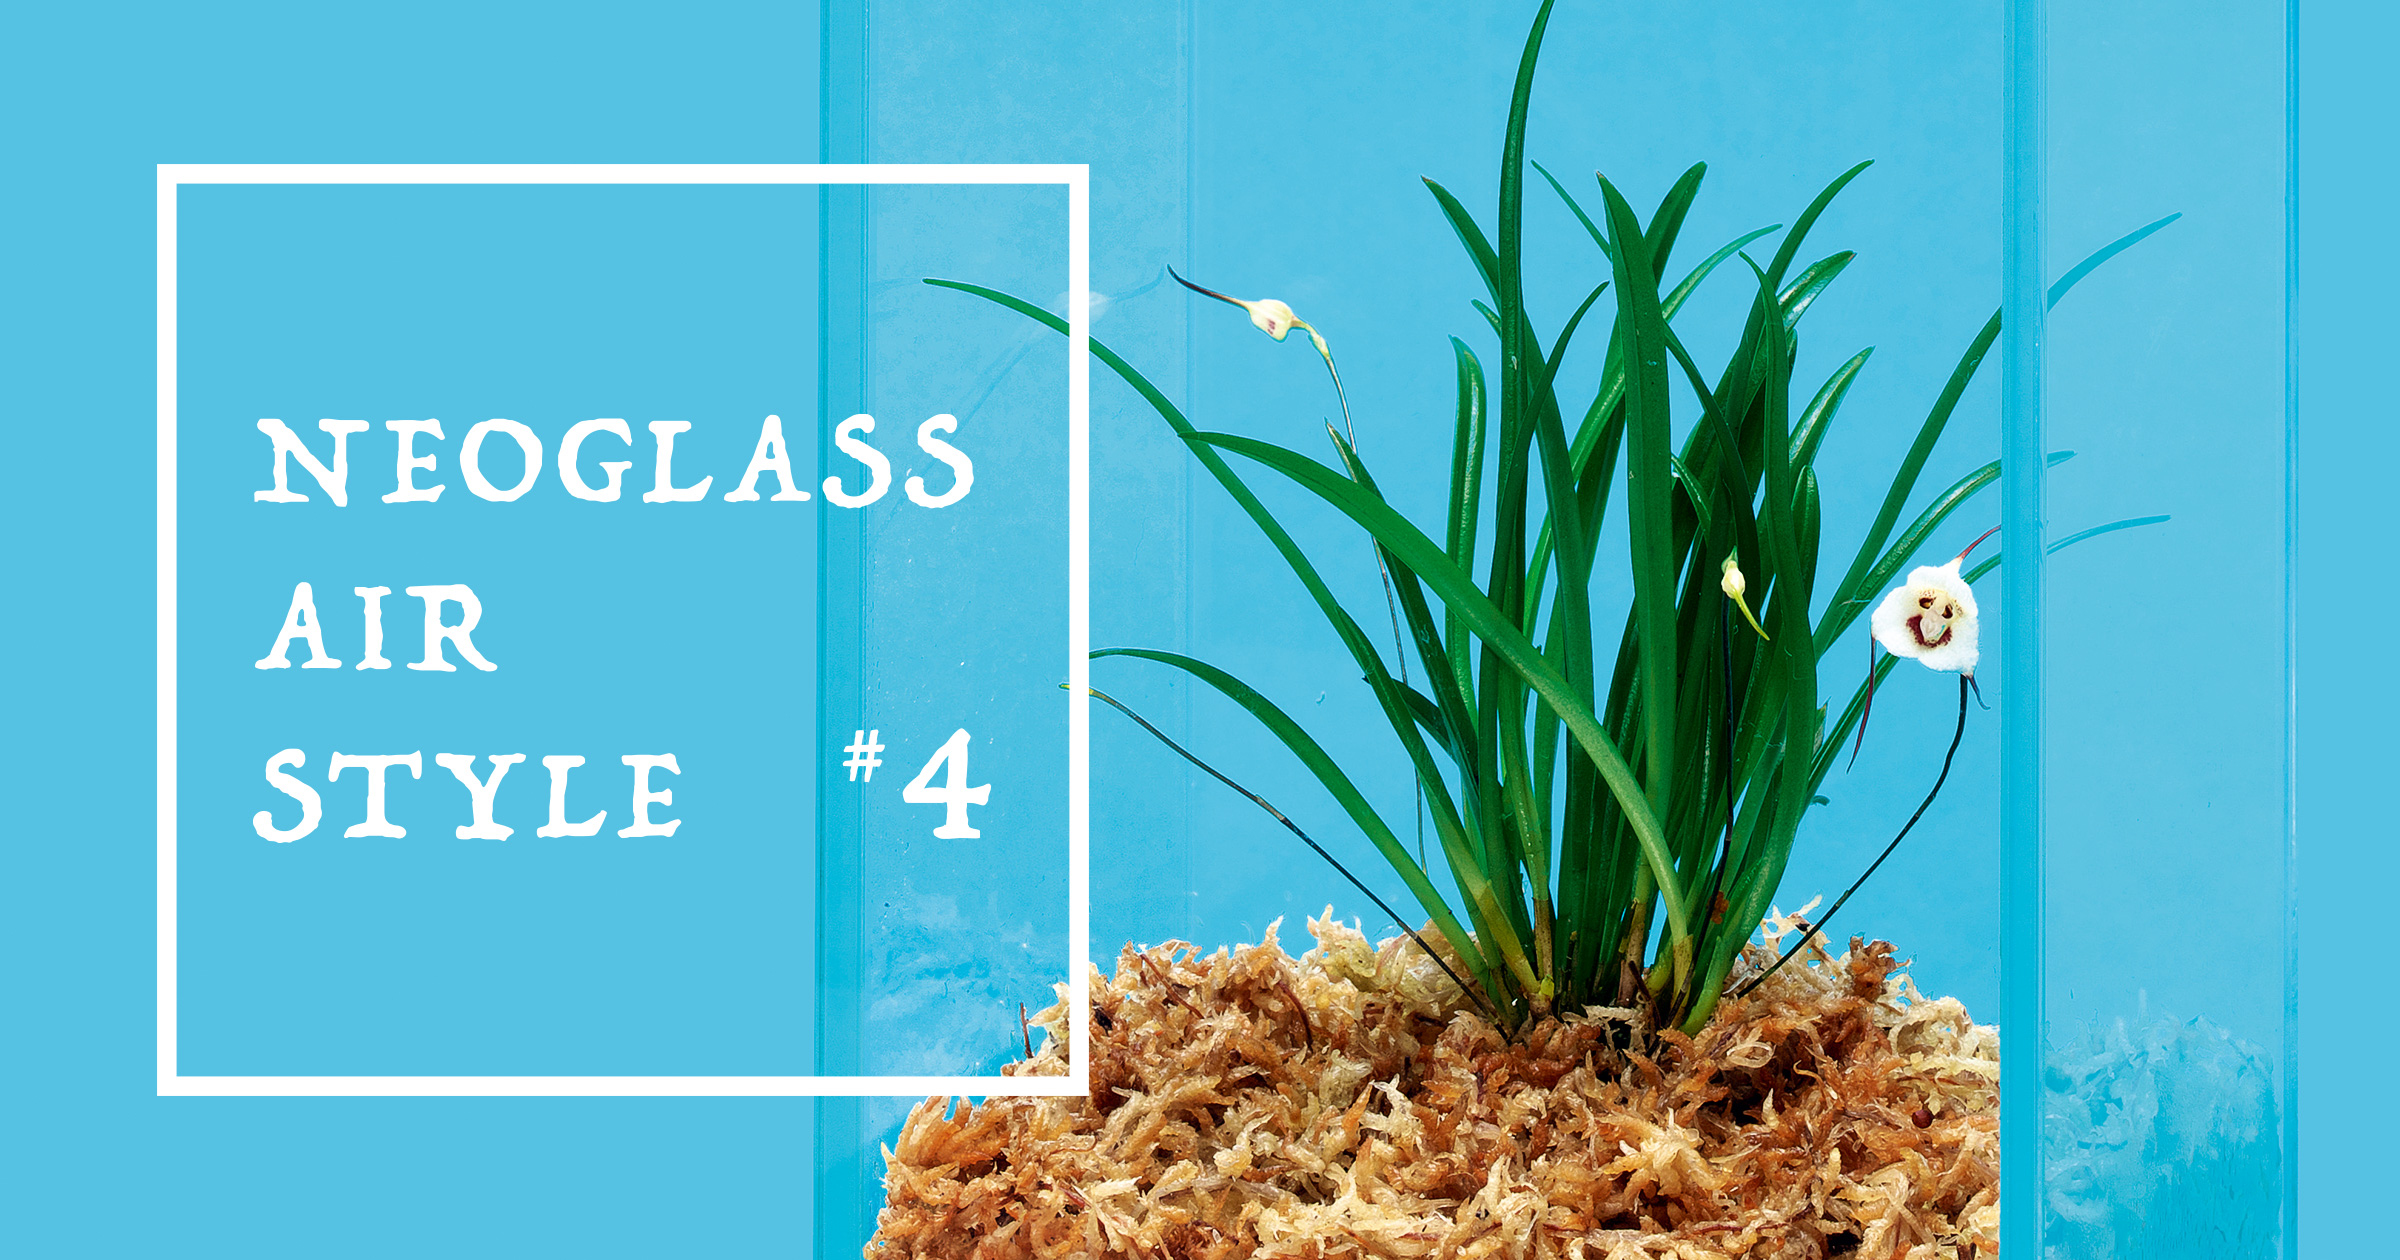 NEOGLASS AIR STYLE #4